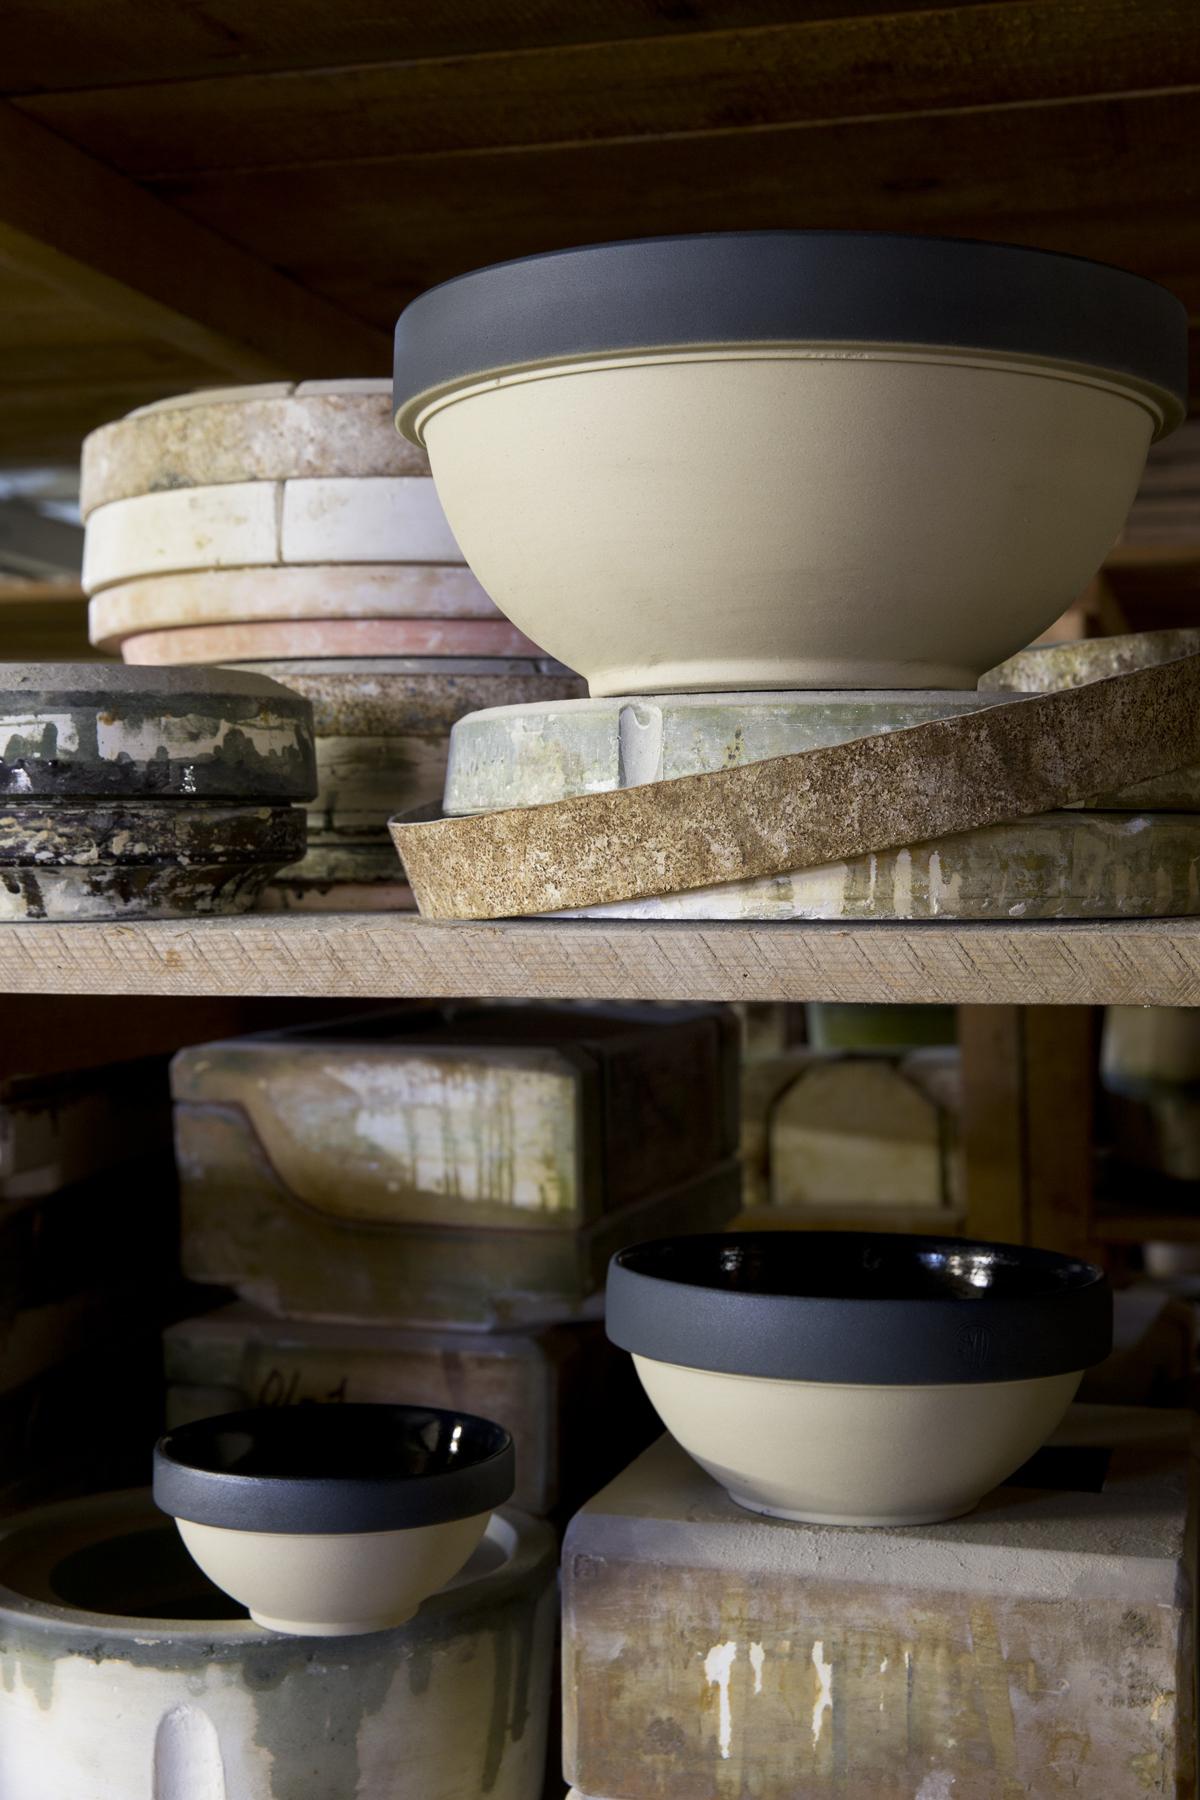 digoin-mixing-bowls-le-reperes-des-belettes-remodelista